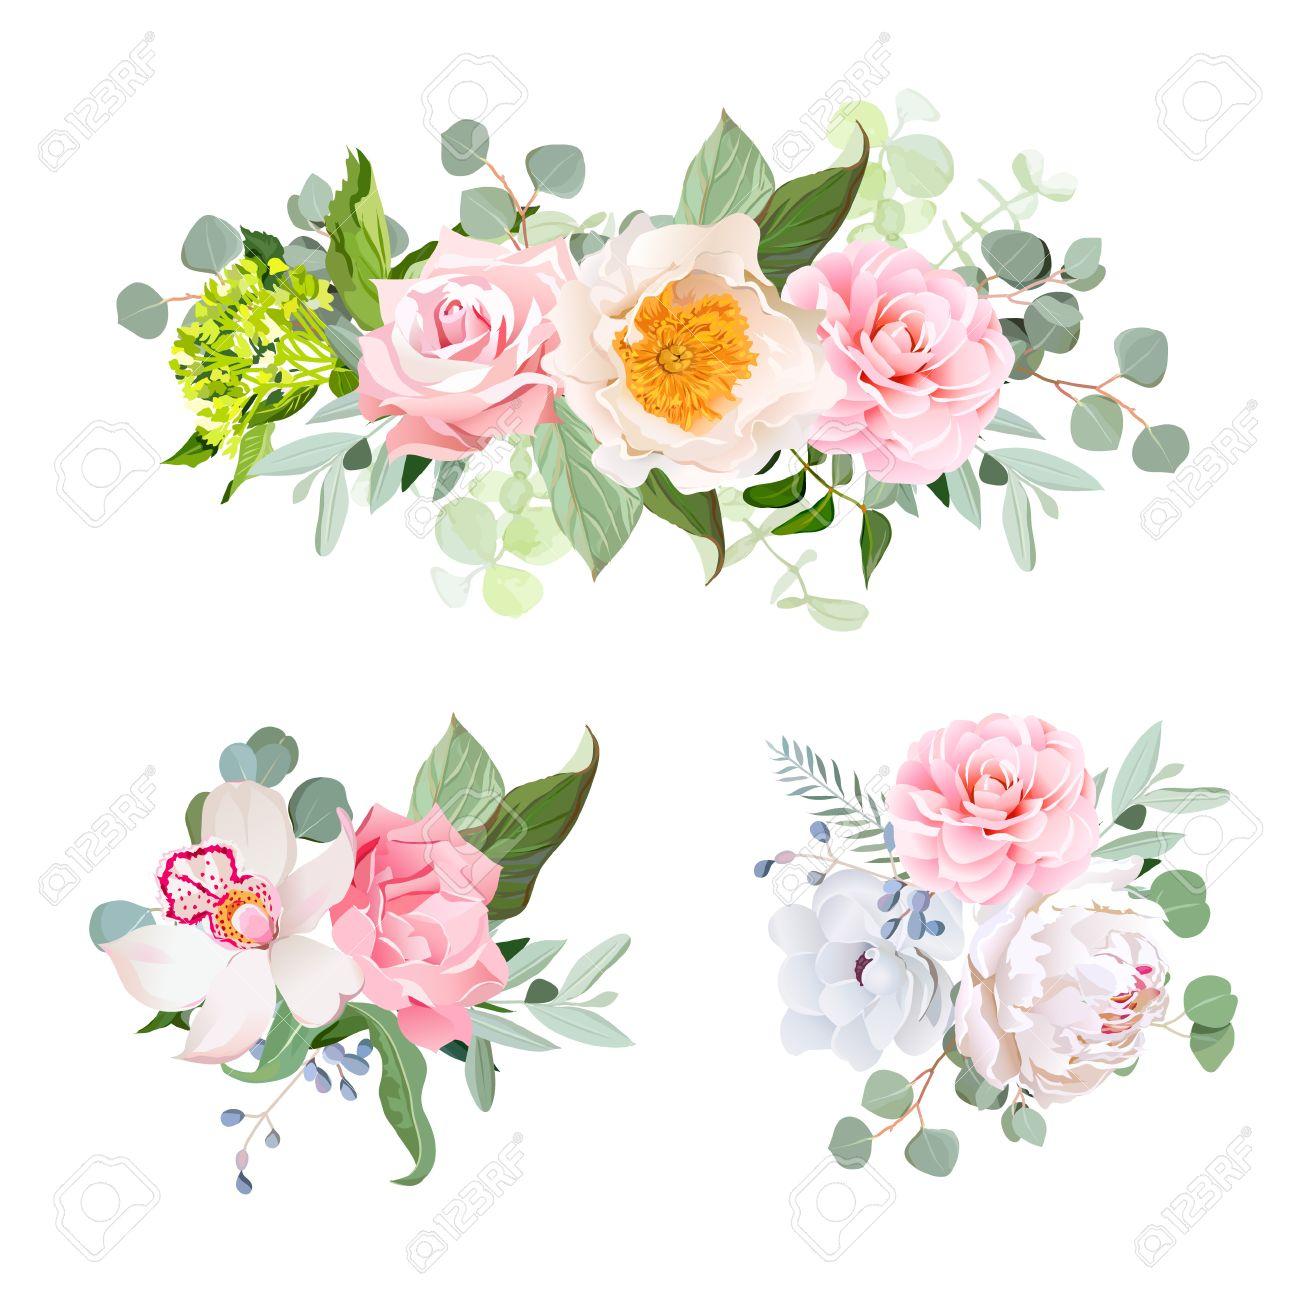 Divers Bouquets De Fleurs Elegant Jeu De Dessin Vectoriel Hydrangea